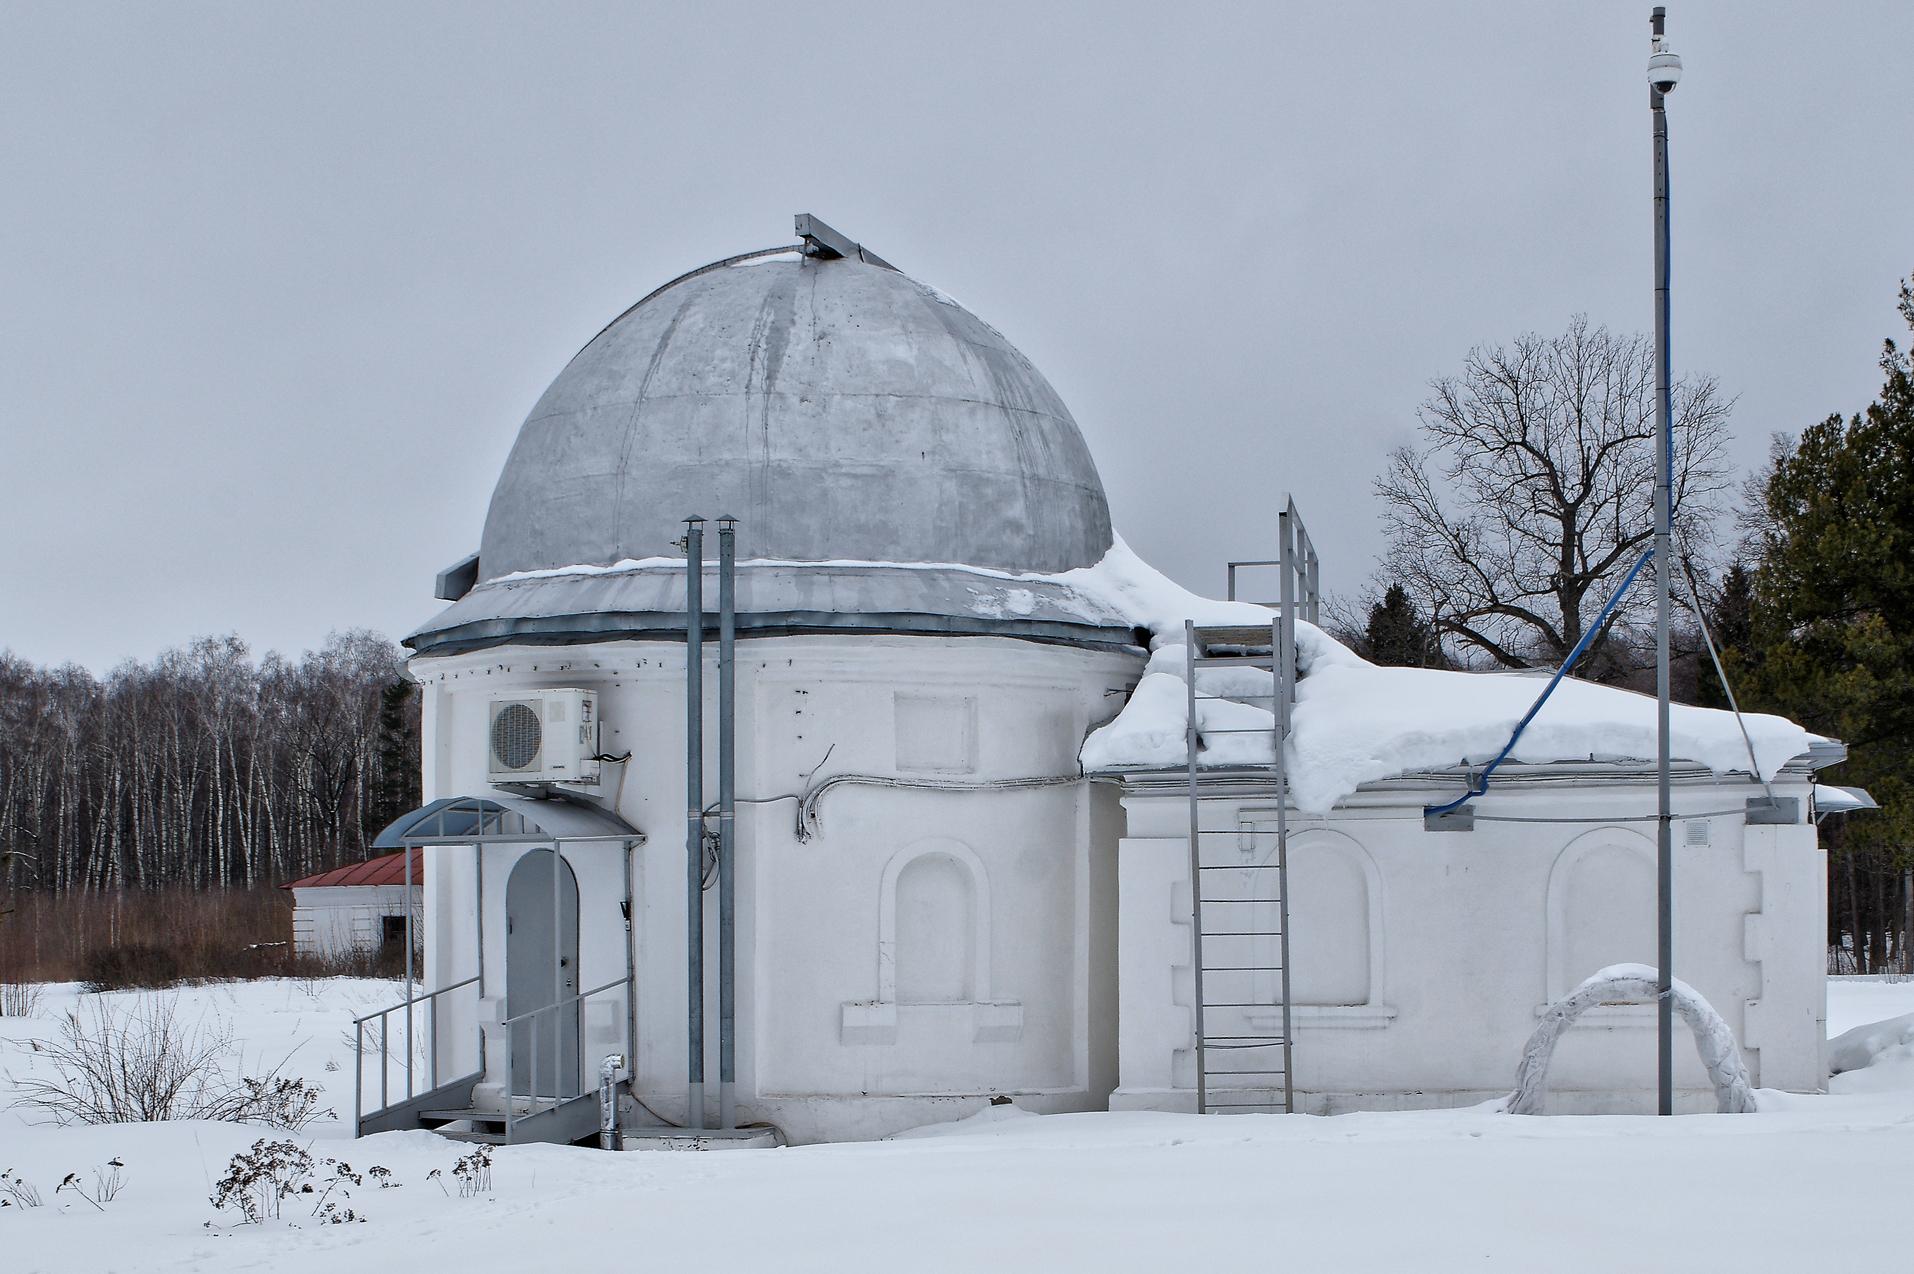 Павильон телескопа АЗТ-14